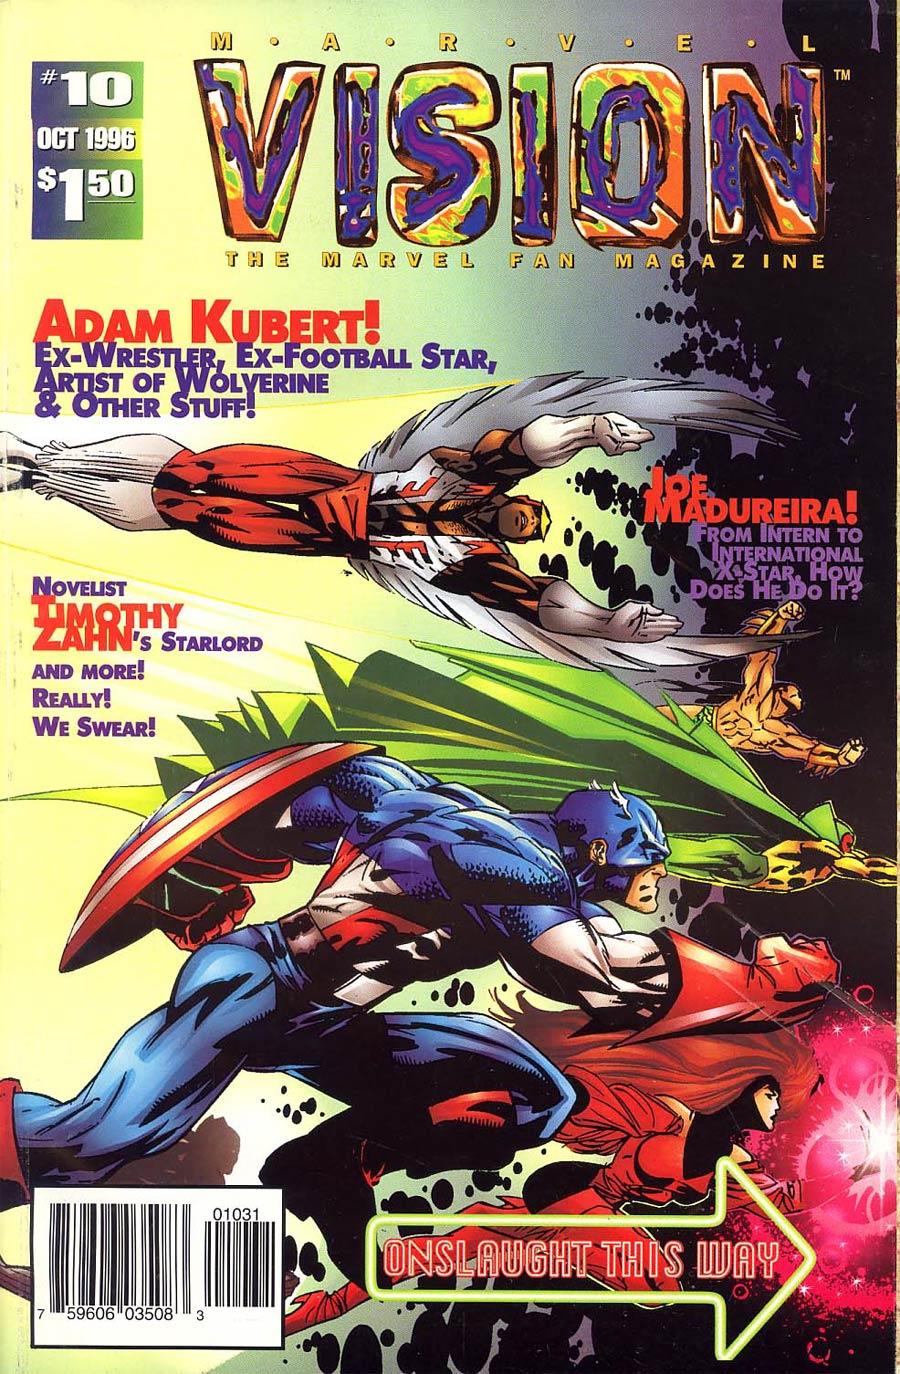 Marvel Vision #10